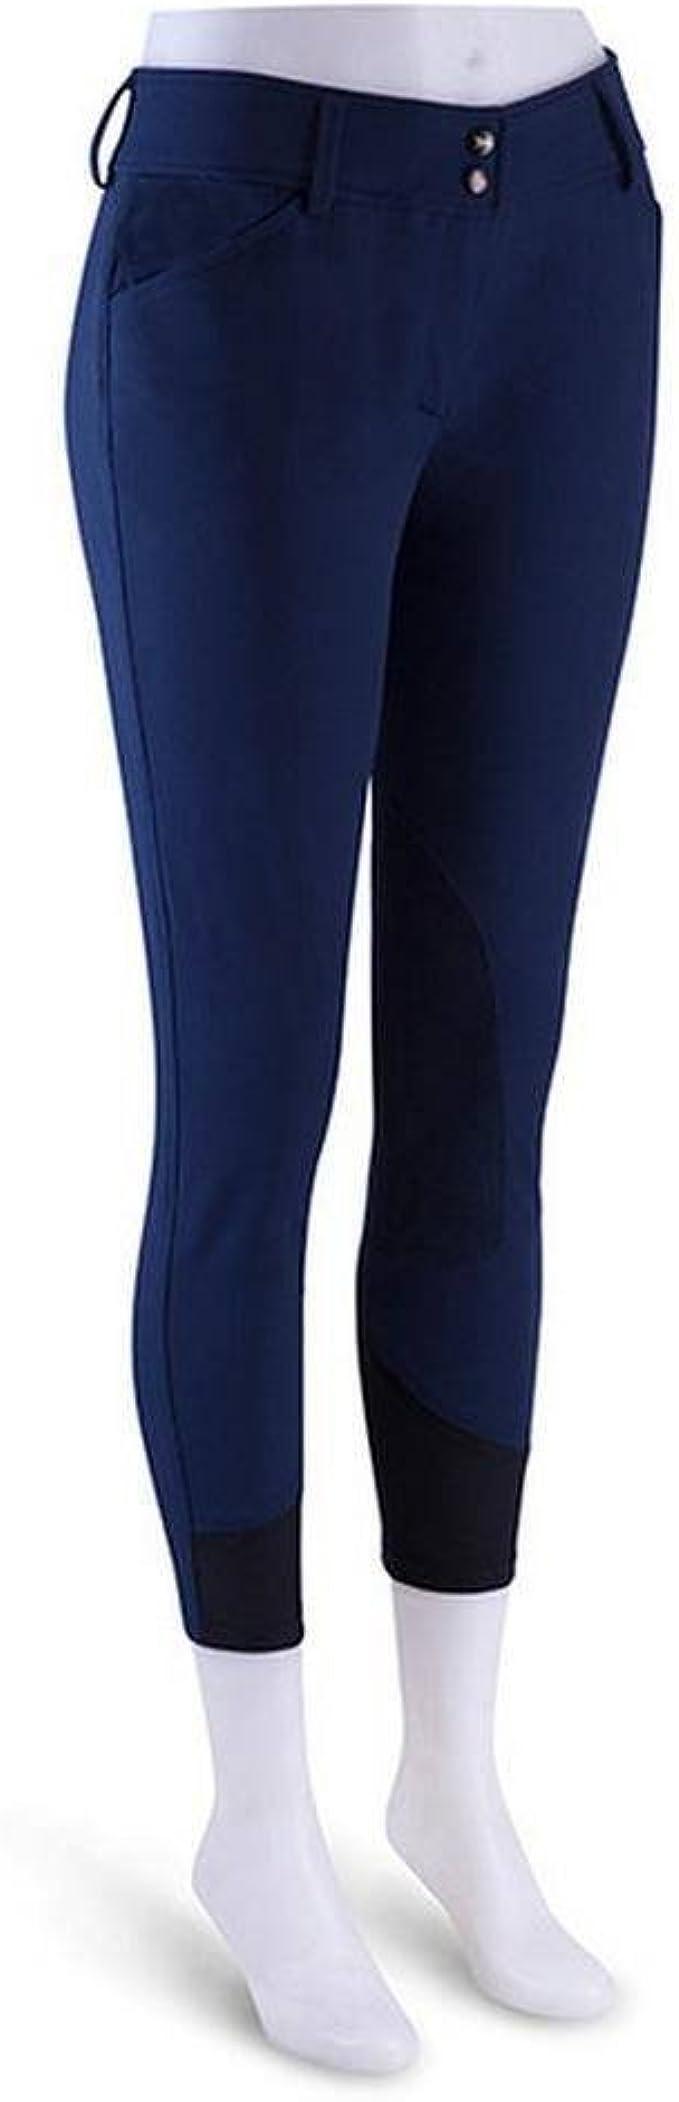 R.J Classics Gulf Low-Rise Front Zip Breeches Deep Blue